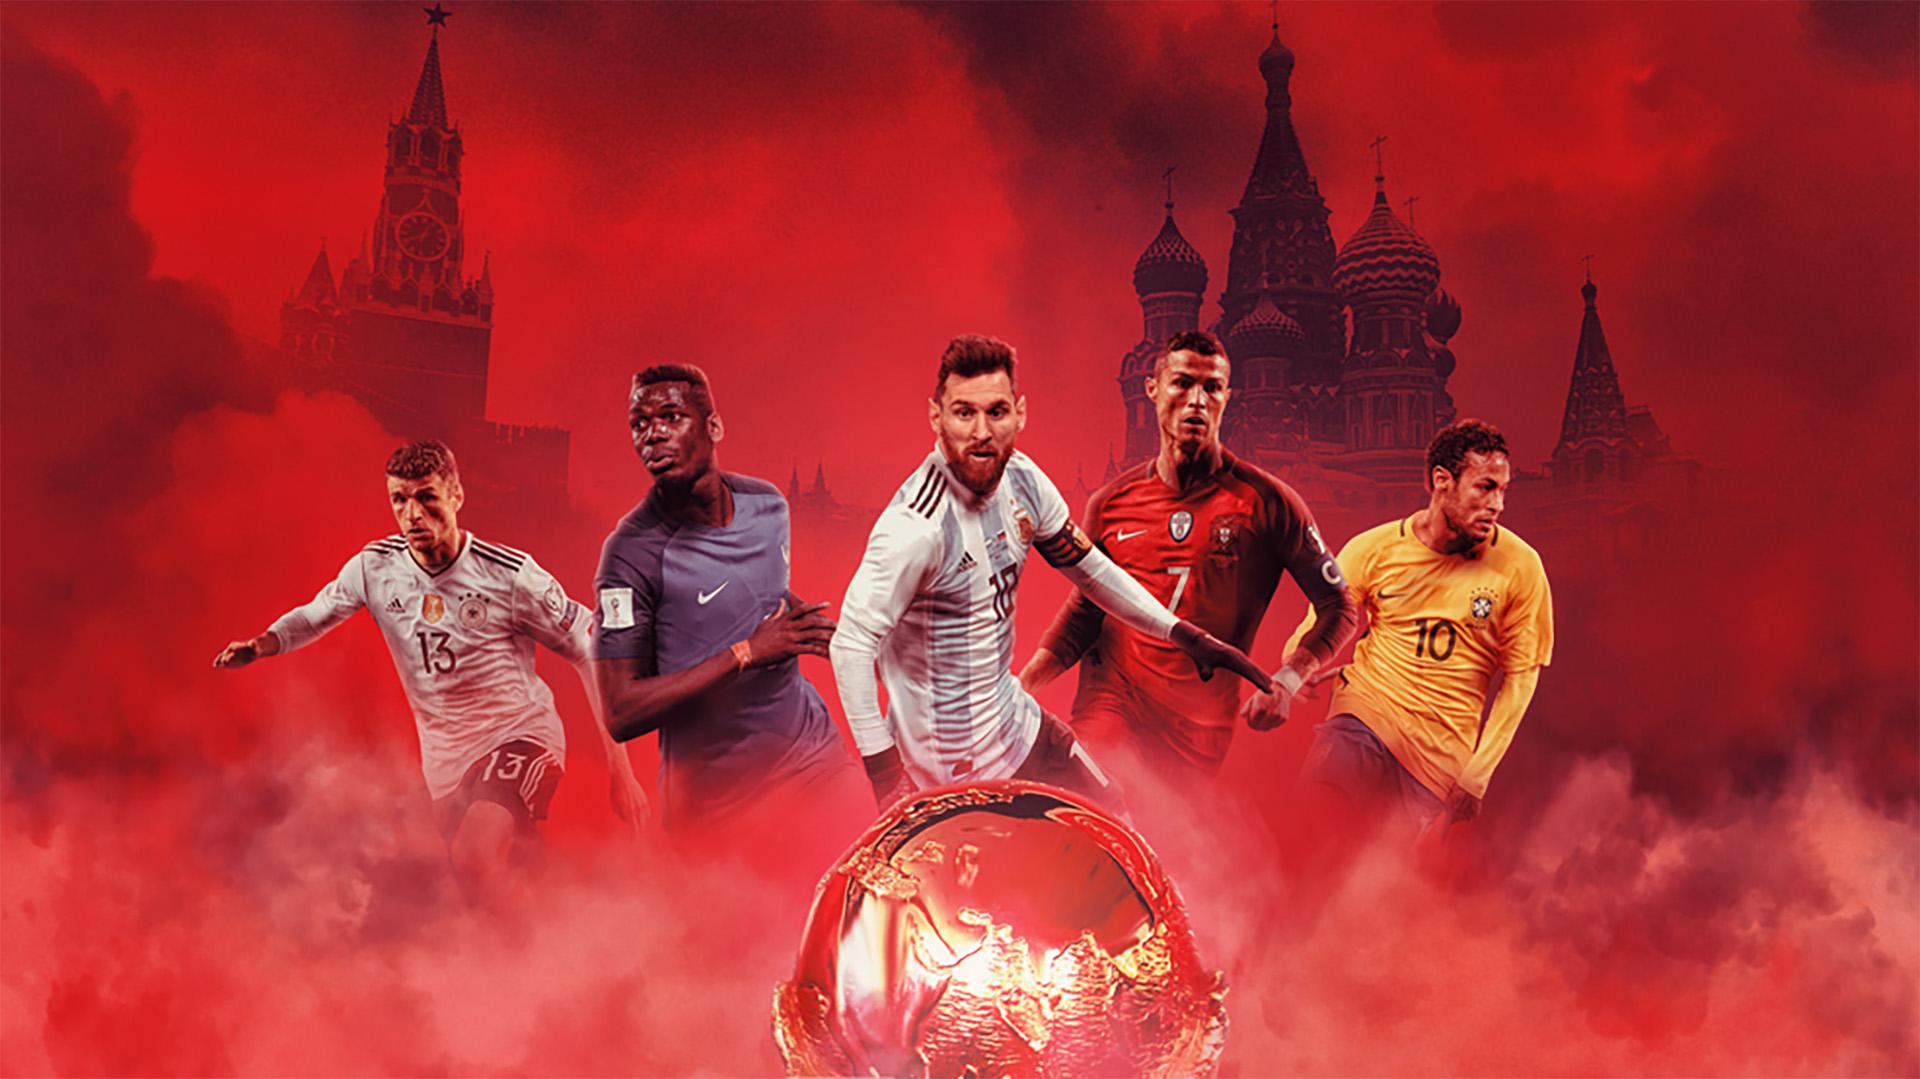 Good Ea Sports World Cup 2018 - world-cup-2018-draw-gfx_177cjqui7ekvy1rnjnm9e1s8it  Snapshot_208360 .jpg?t\u003d300754456